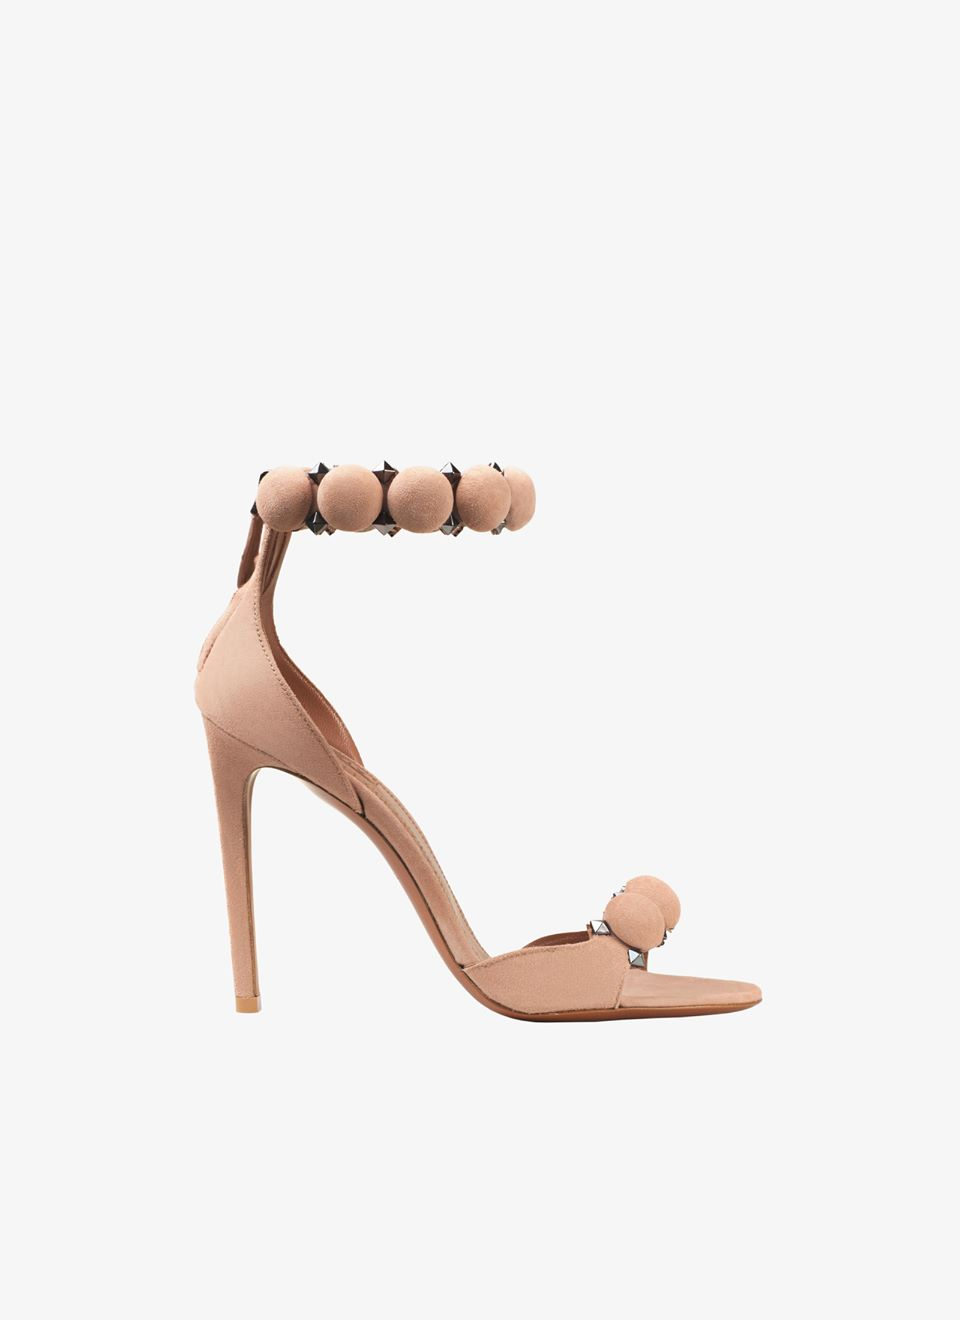 Alaïa Sandals, Size 3, Color Light Pink